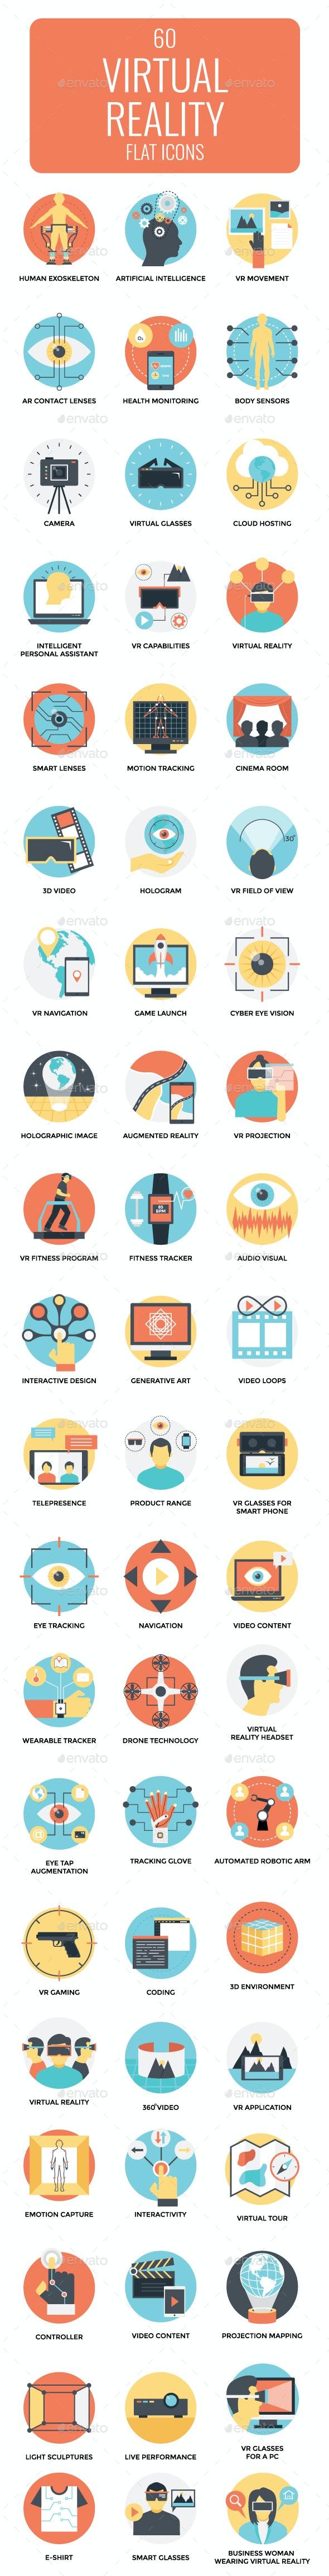 60 Flat Virtual Reality Icons Set - Icons